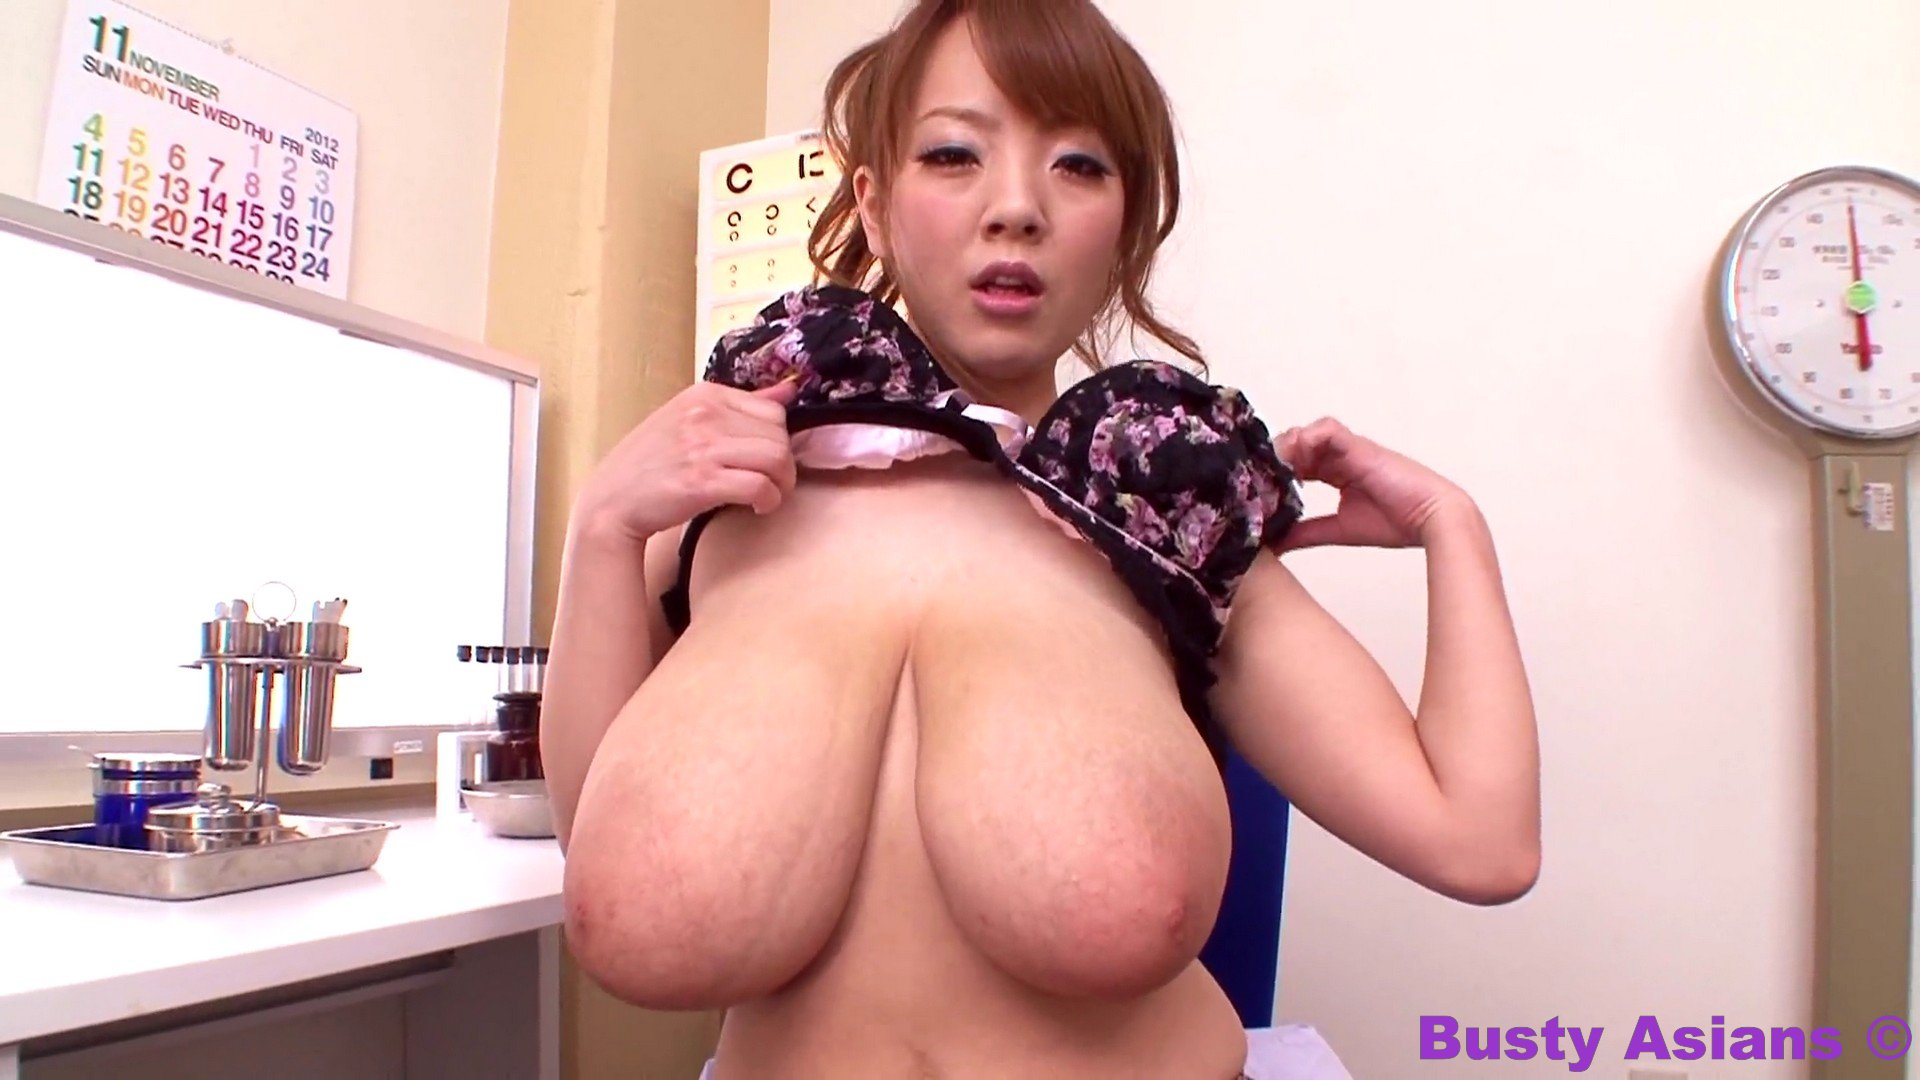 Сиськи хитоми танака, Хитоми Танака - смотреть порно видео с Hitomi Tanaka 8 фотография